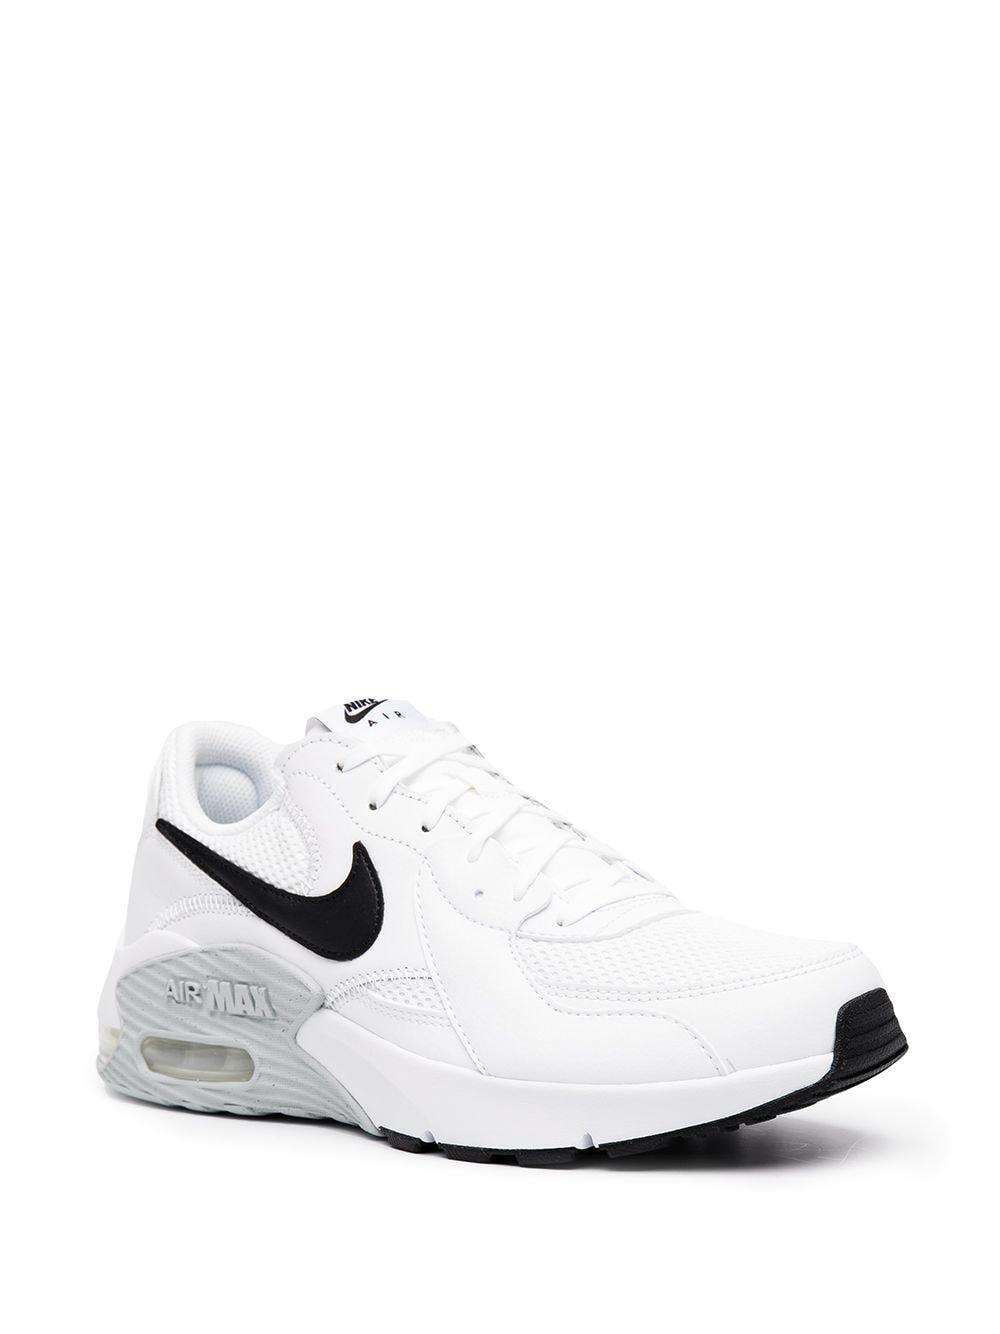 Baskets Air Max Excee Cuir Nike pour homme en coloris Blanc jHxY